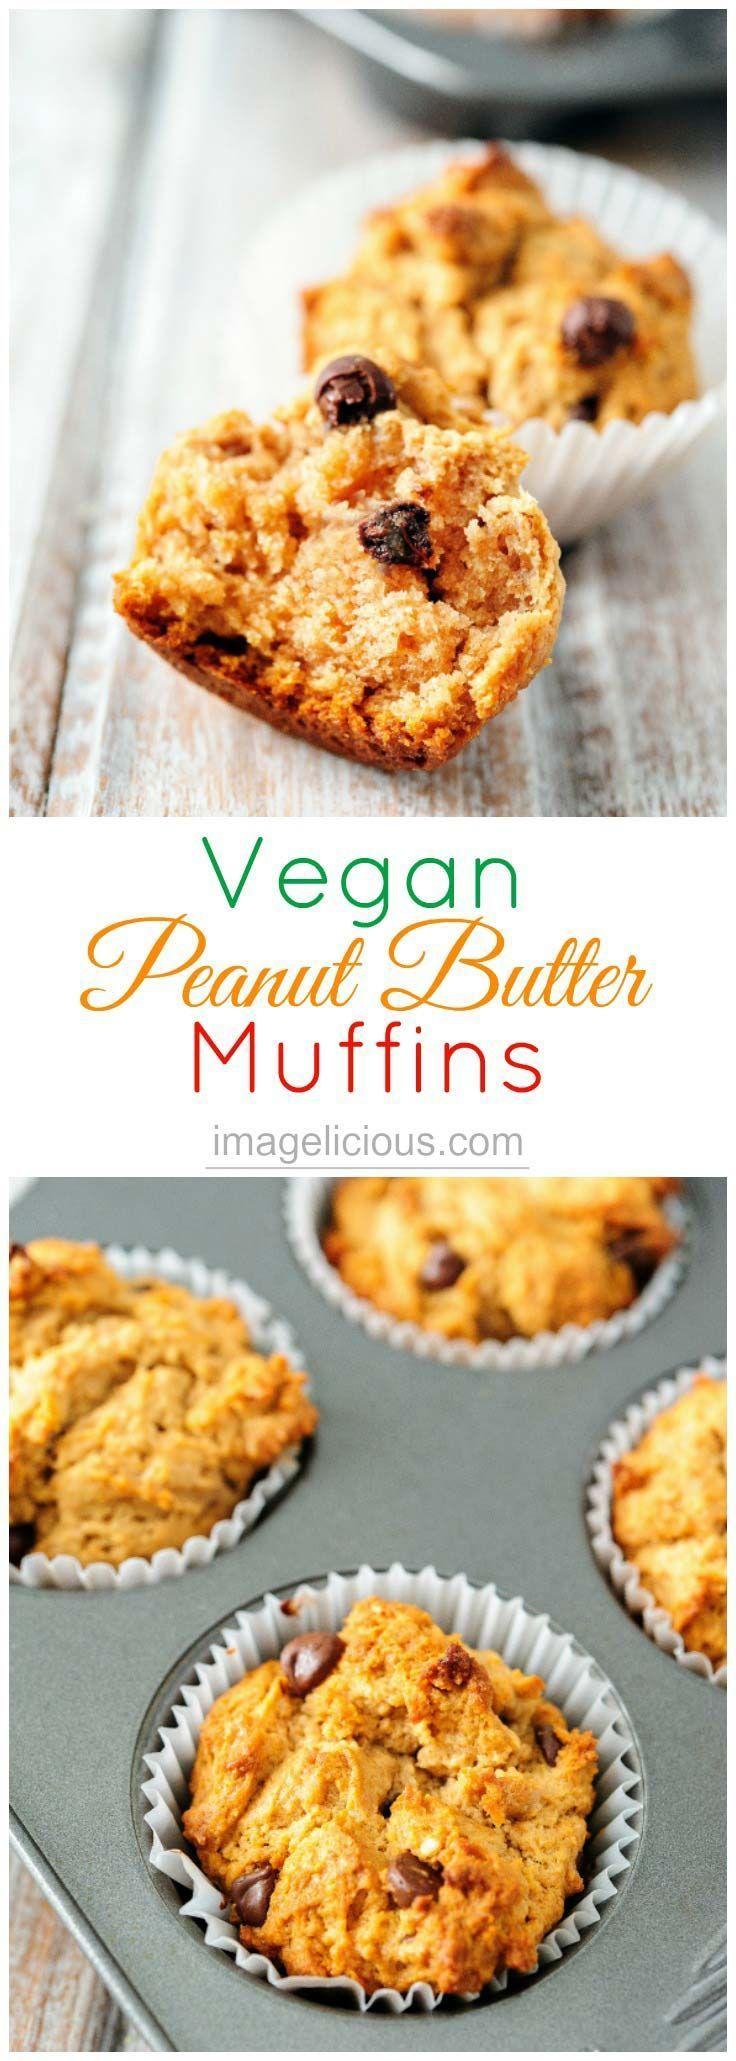 Vegan Peanut Butter Muffins With Chocolate Chips Imagelicious Com Recipe Vegan Peanut Butter Peanut Butter Muffins Snacks